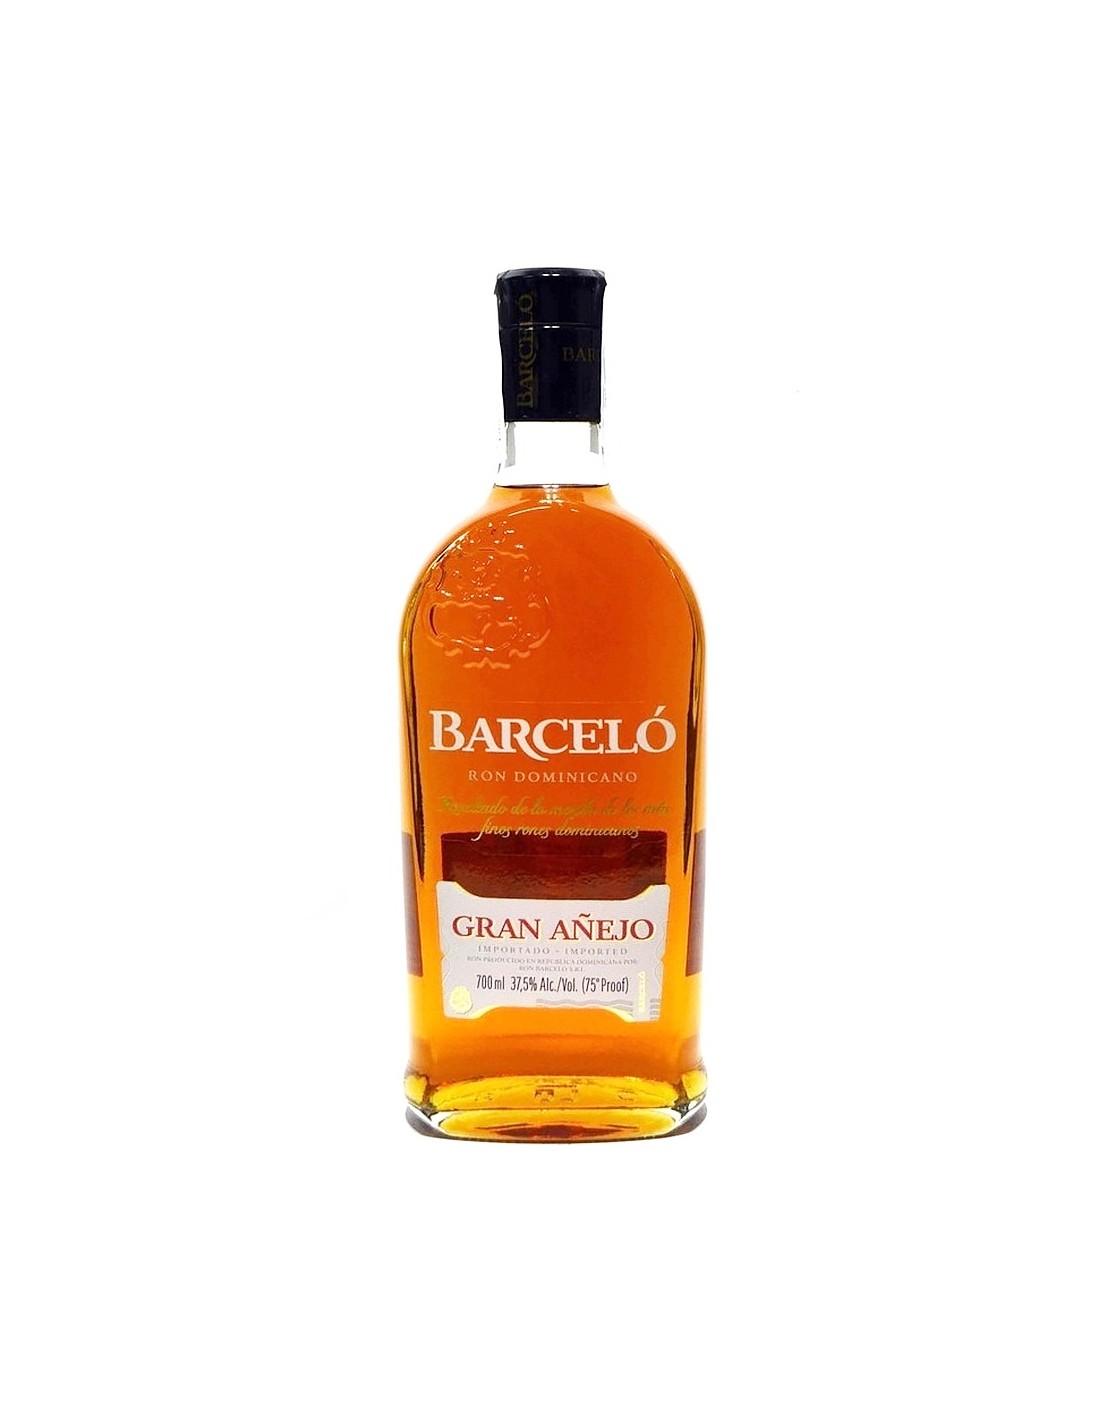 Rom negru Barcelo Gran Anejo, 37.5% alc., 0.7L